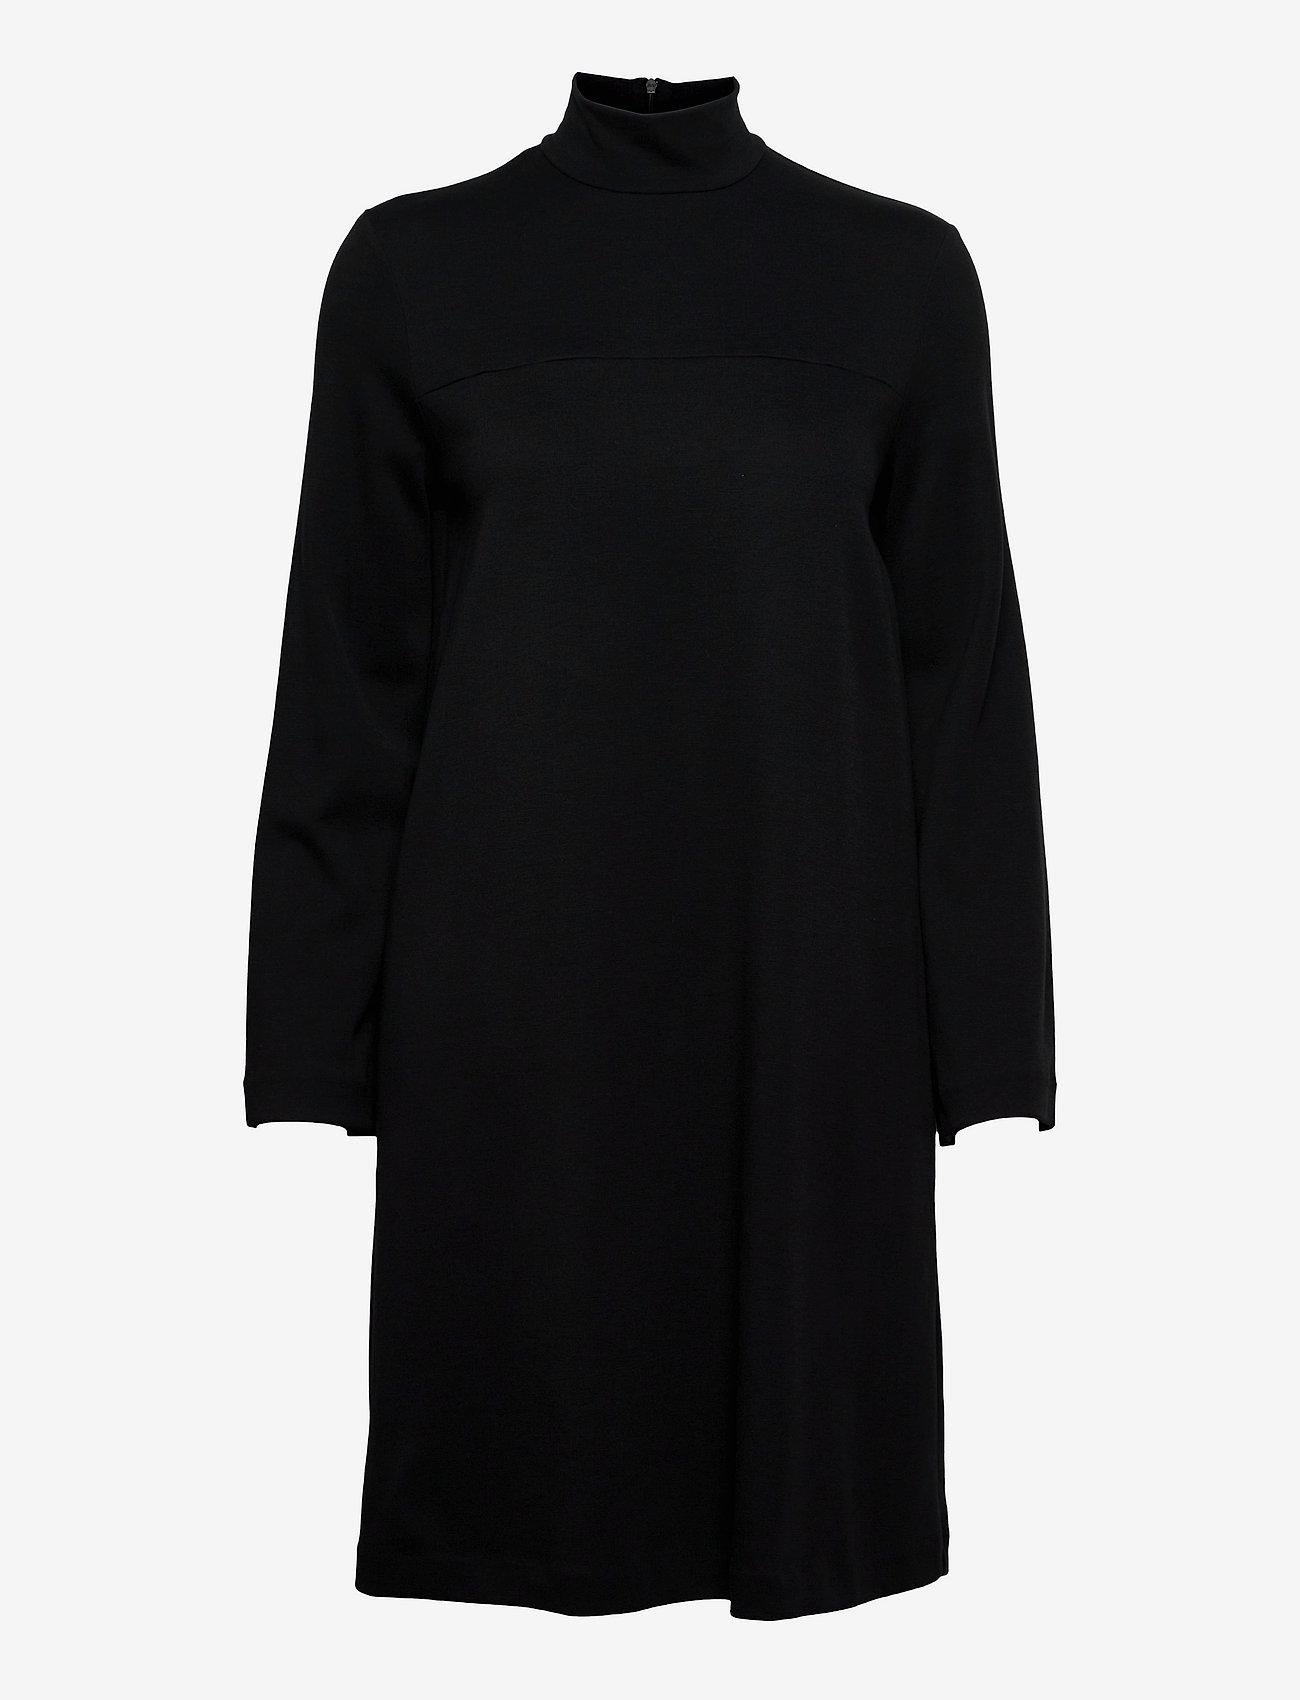 Max Mara Leisure - TRENTO - midi dresses - black - 0